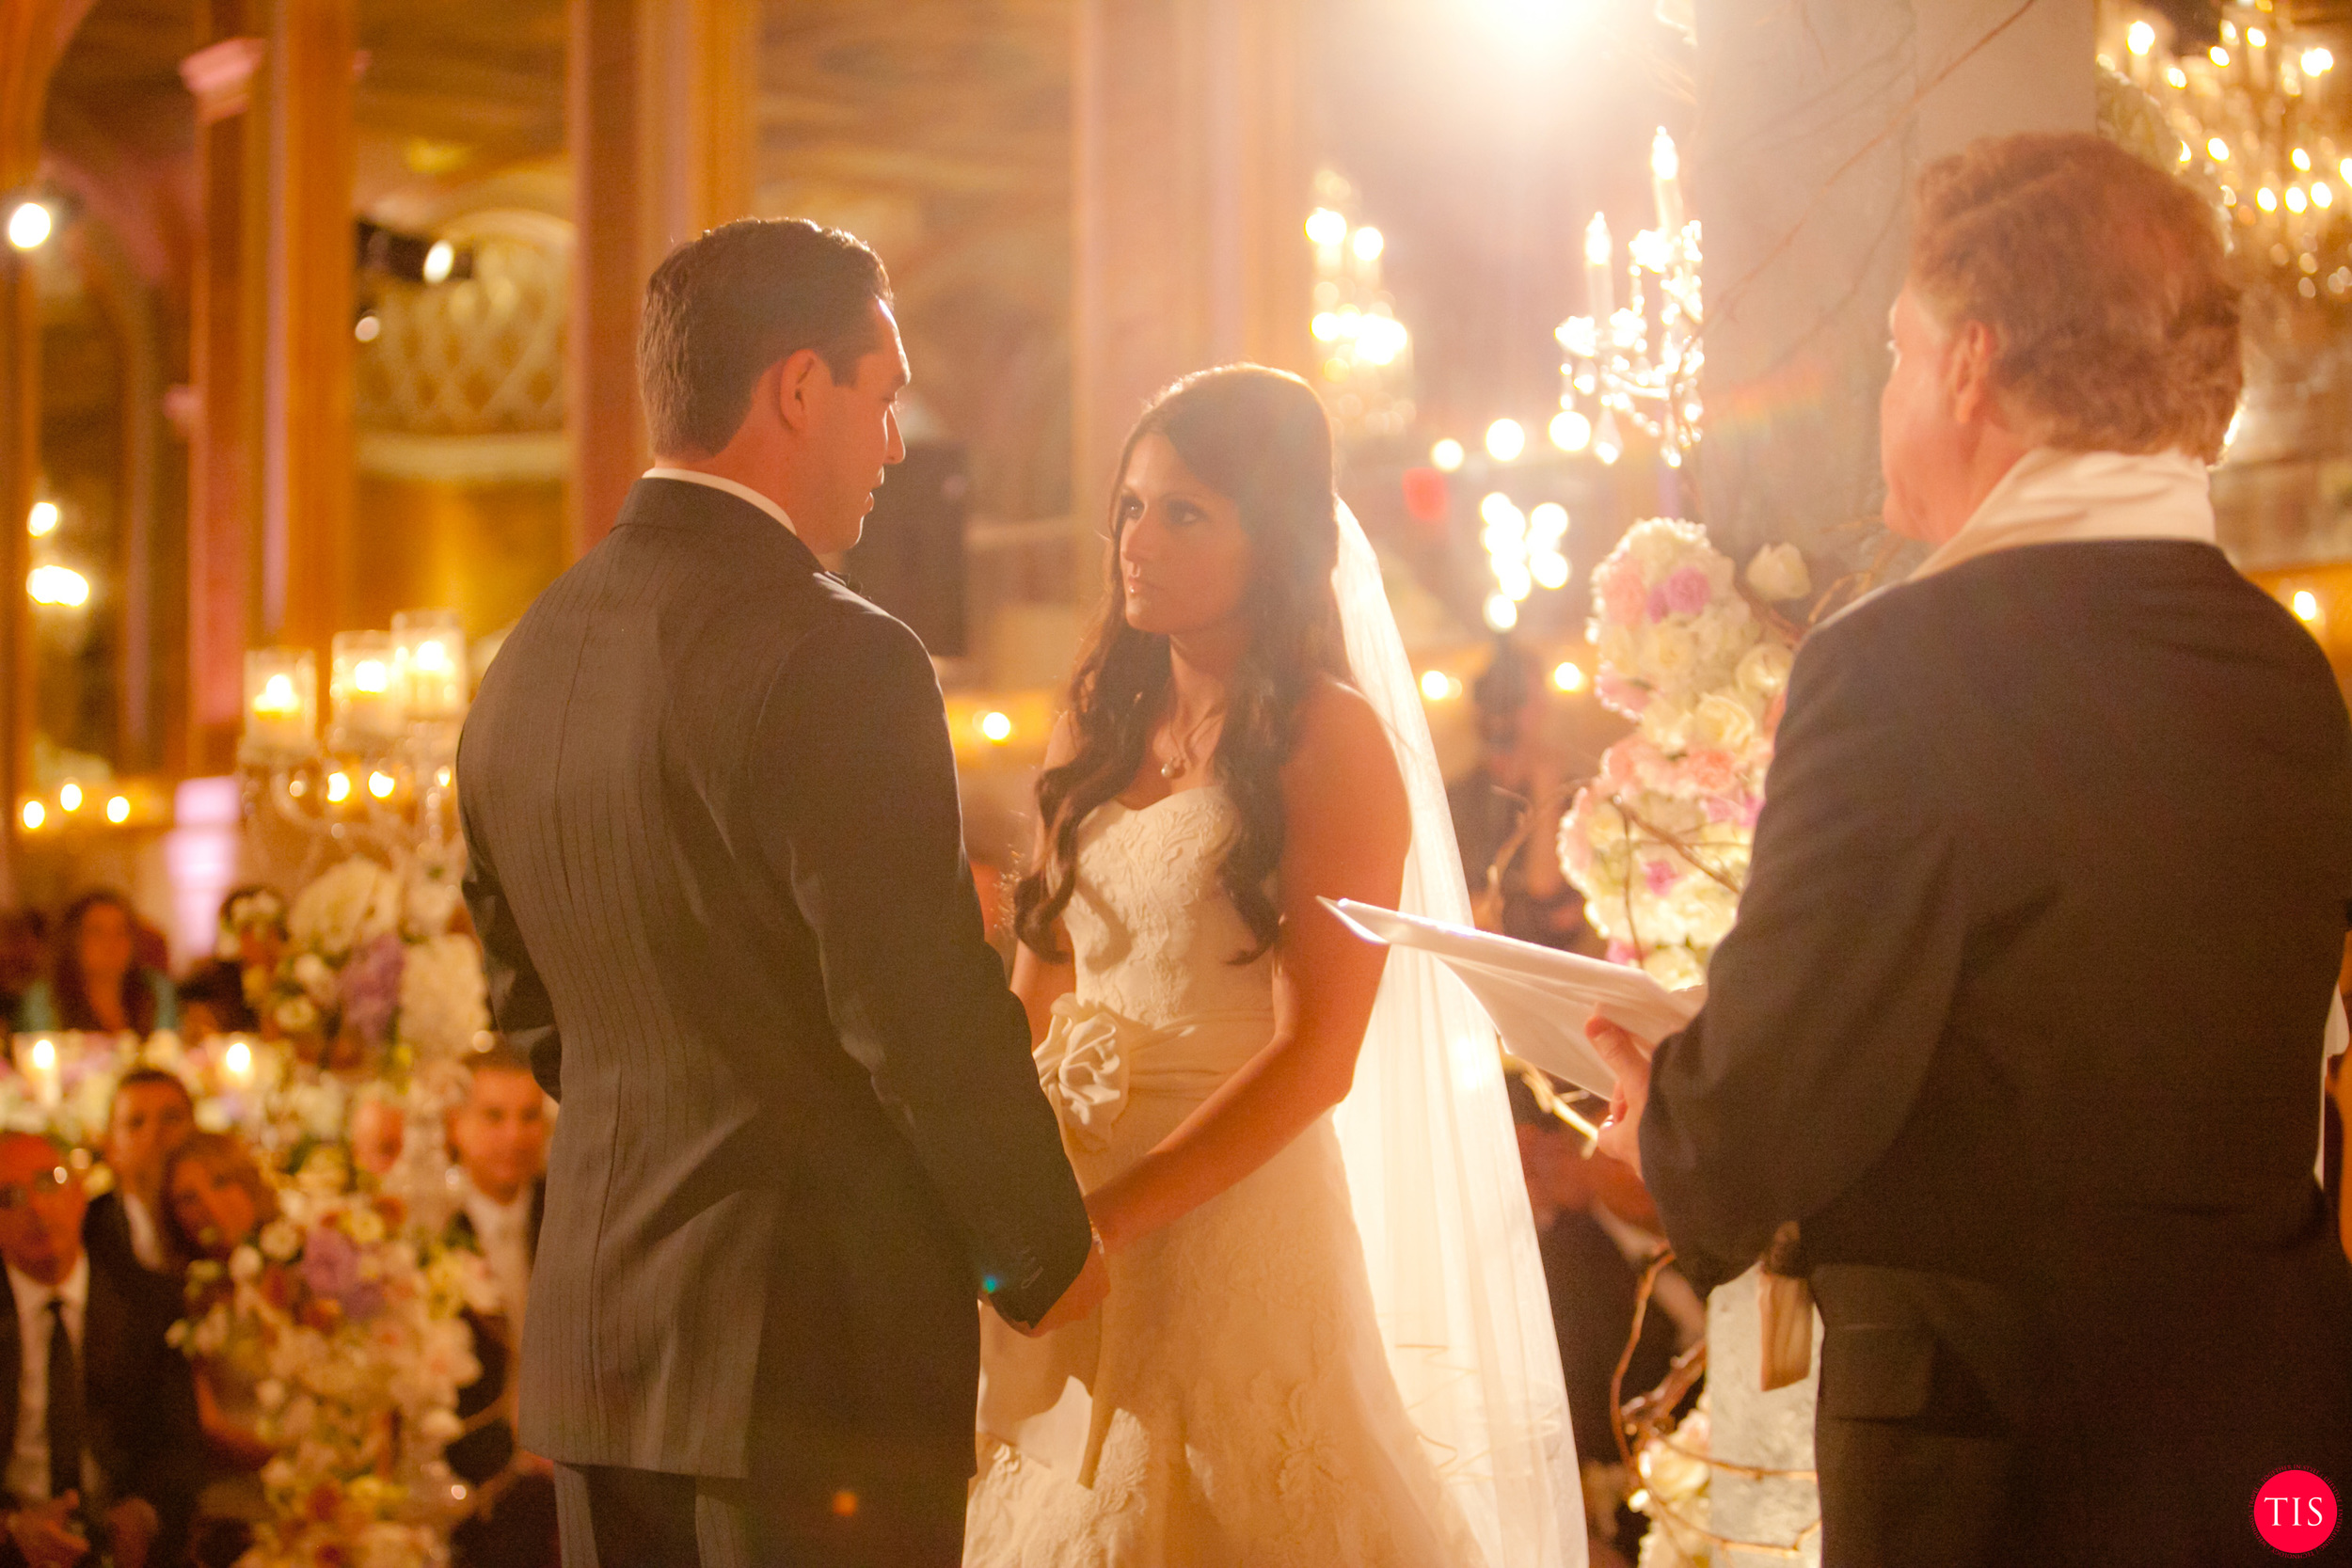 Luxury Wedding at The Plaza Hotel NYC designed by David Tutera